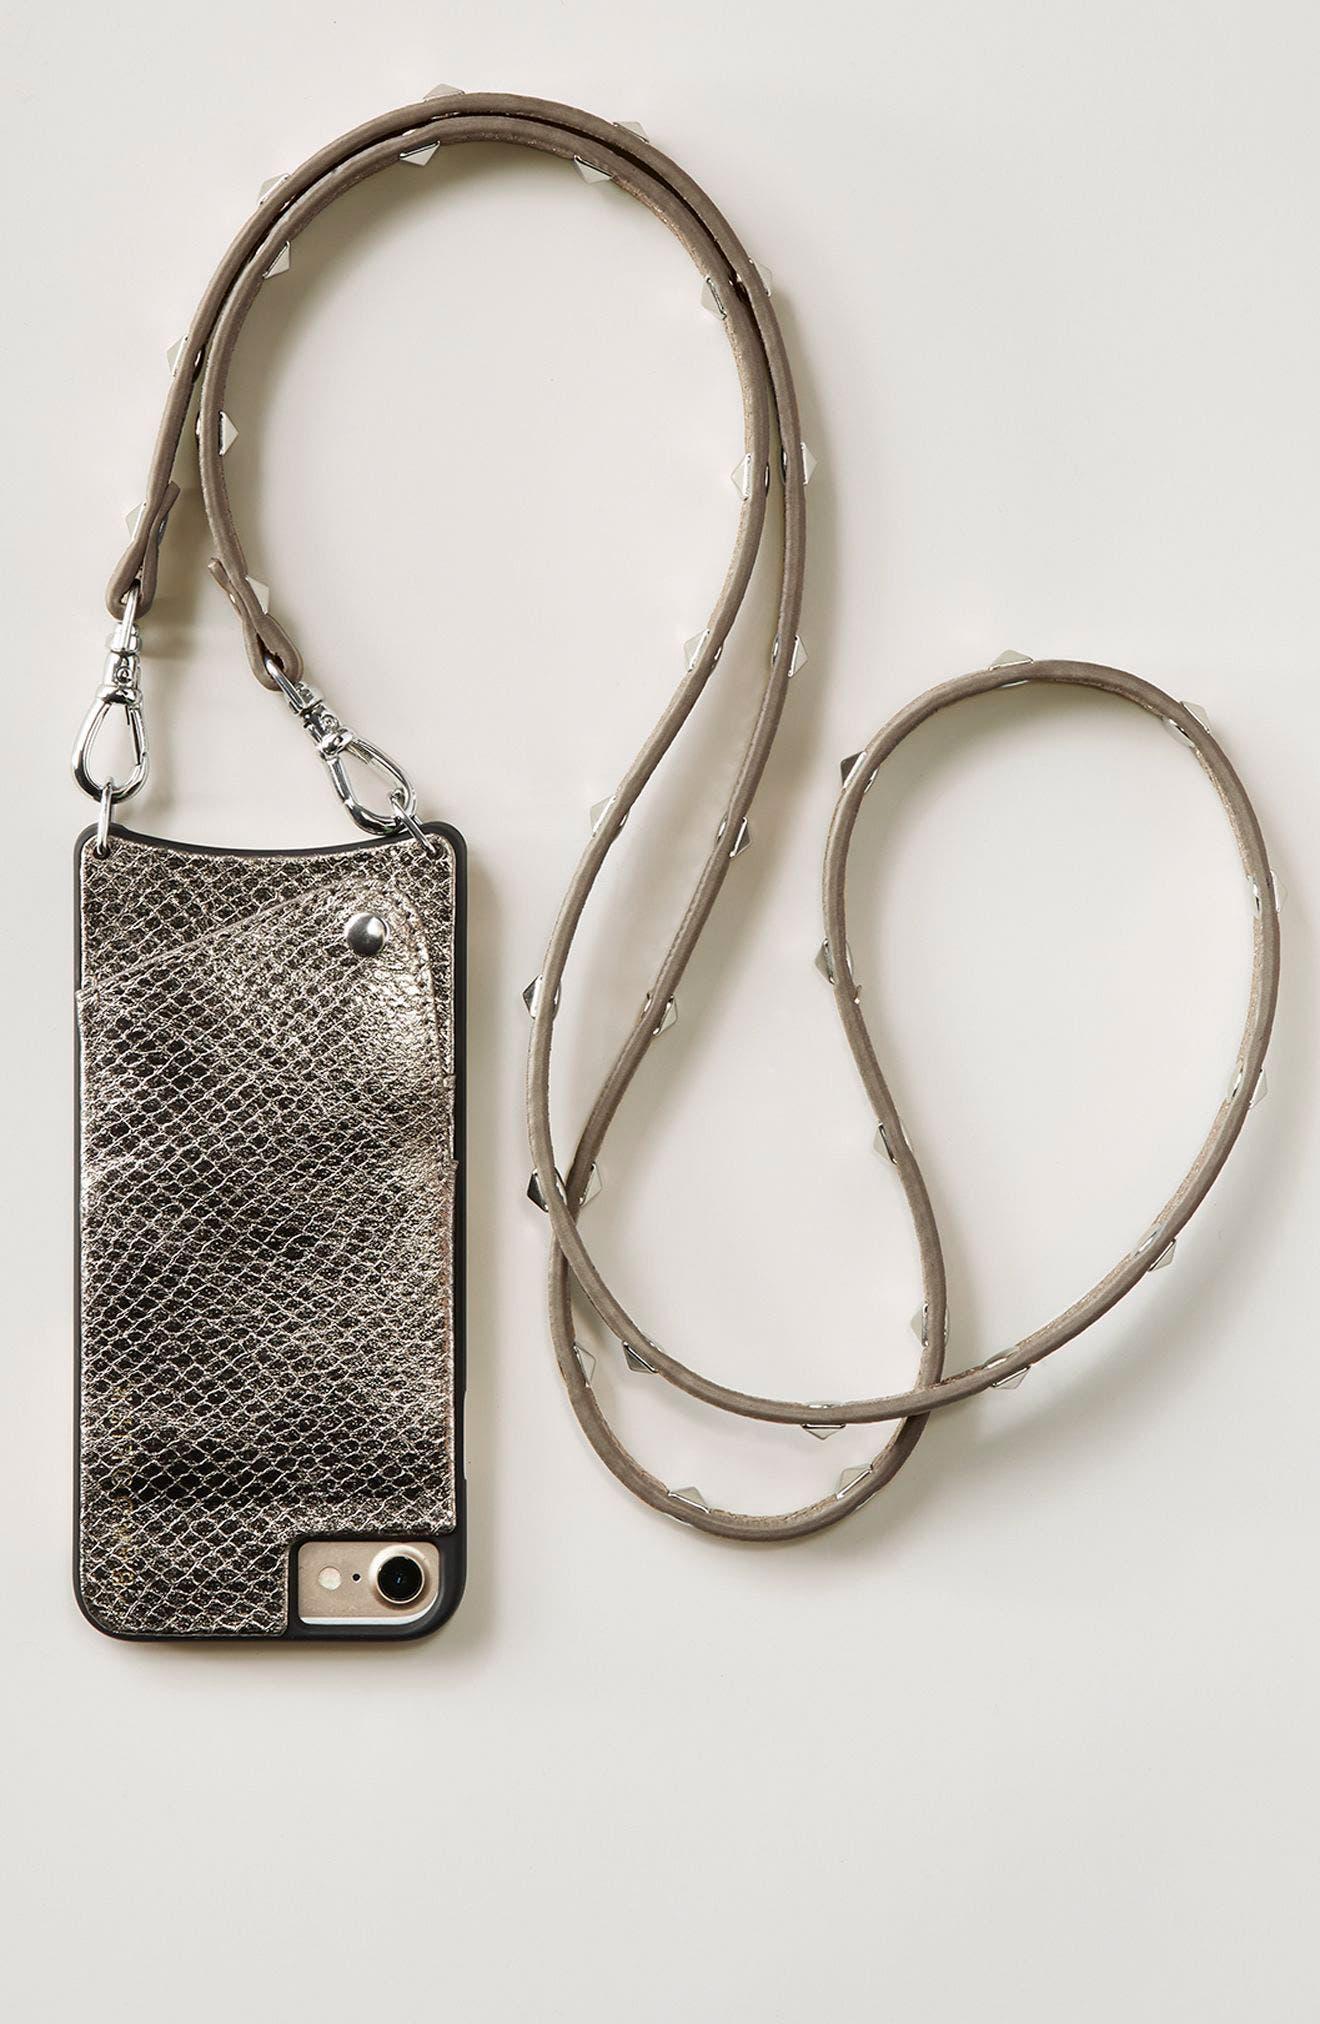 Sarah Metallic Faux Snakeskin iPhone 6/7/8 & 6/7/8 Plus Crossbody Case,                             Alternate thumbnail 7, color,                             PEWTER/ SILVER